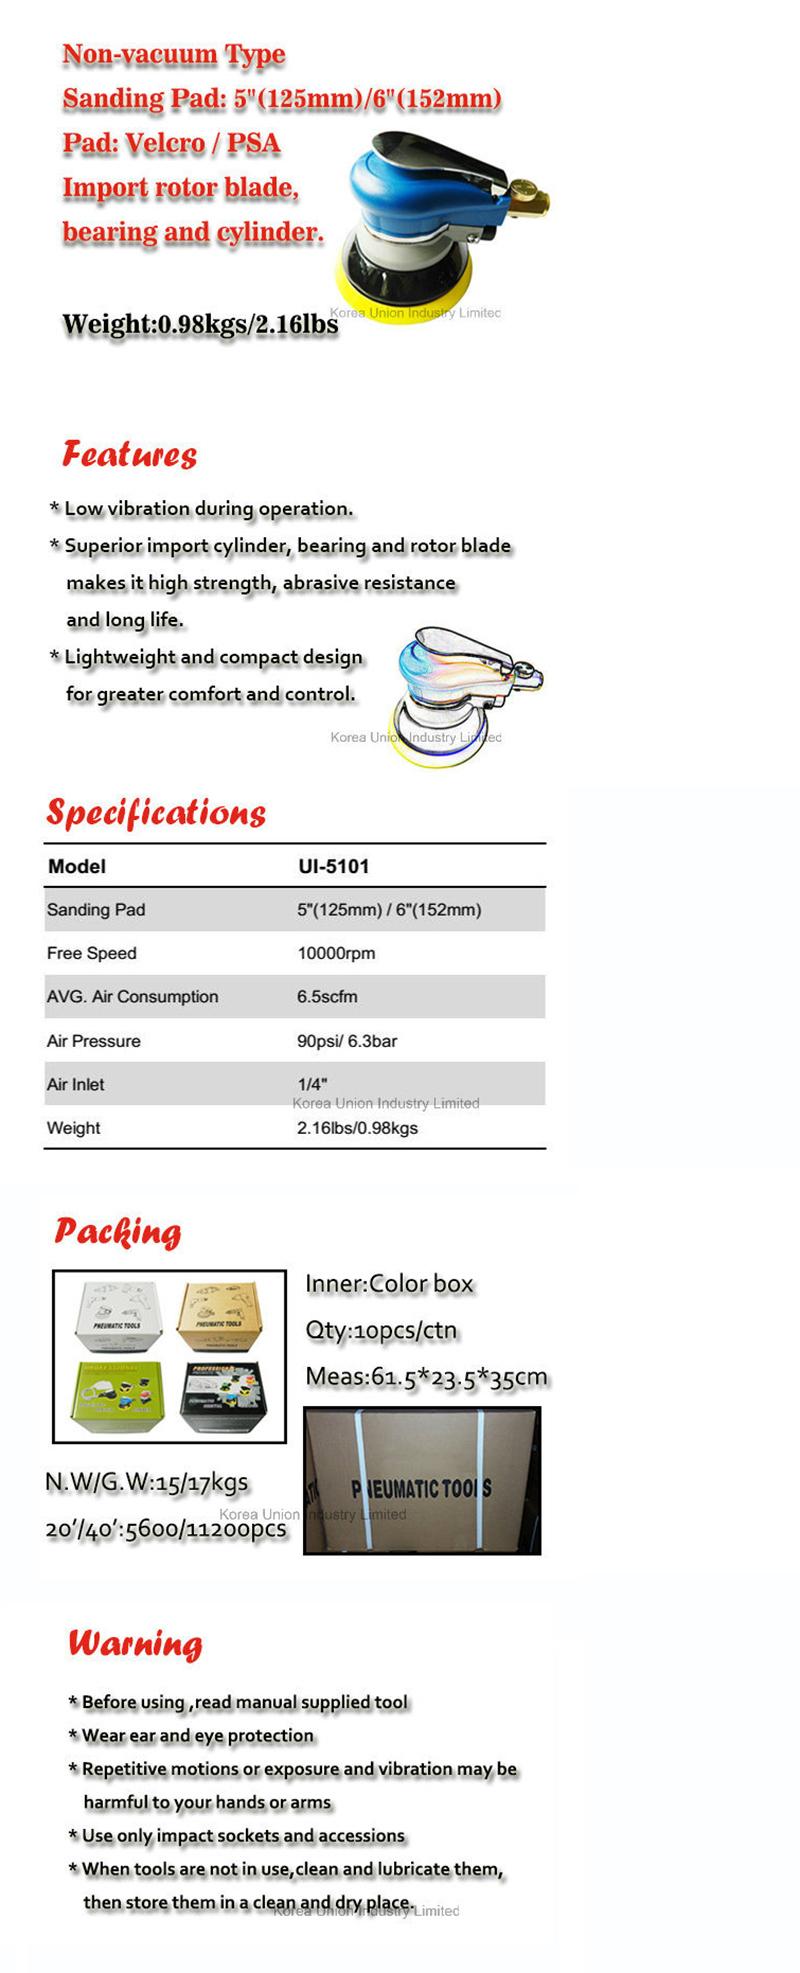 Hand Sander Pneumatic Abrasive Polishing Tool Air Palm Sander Ui-510109